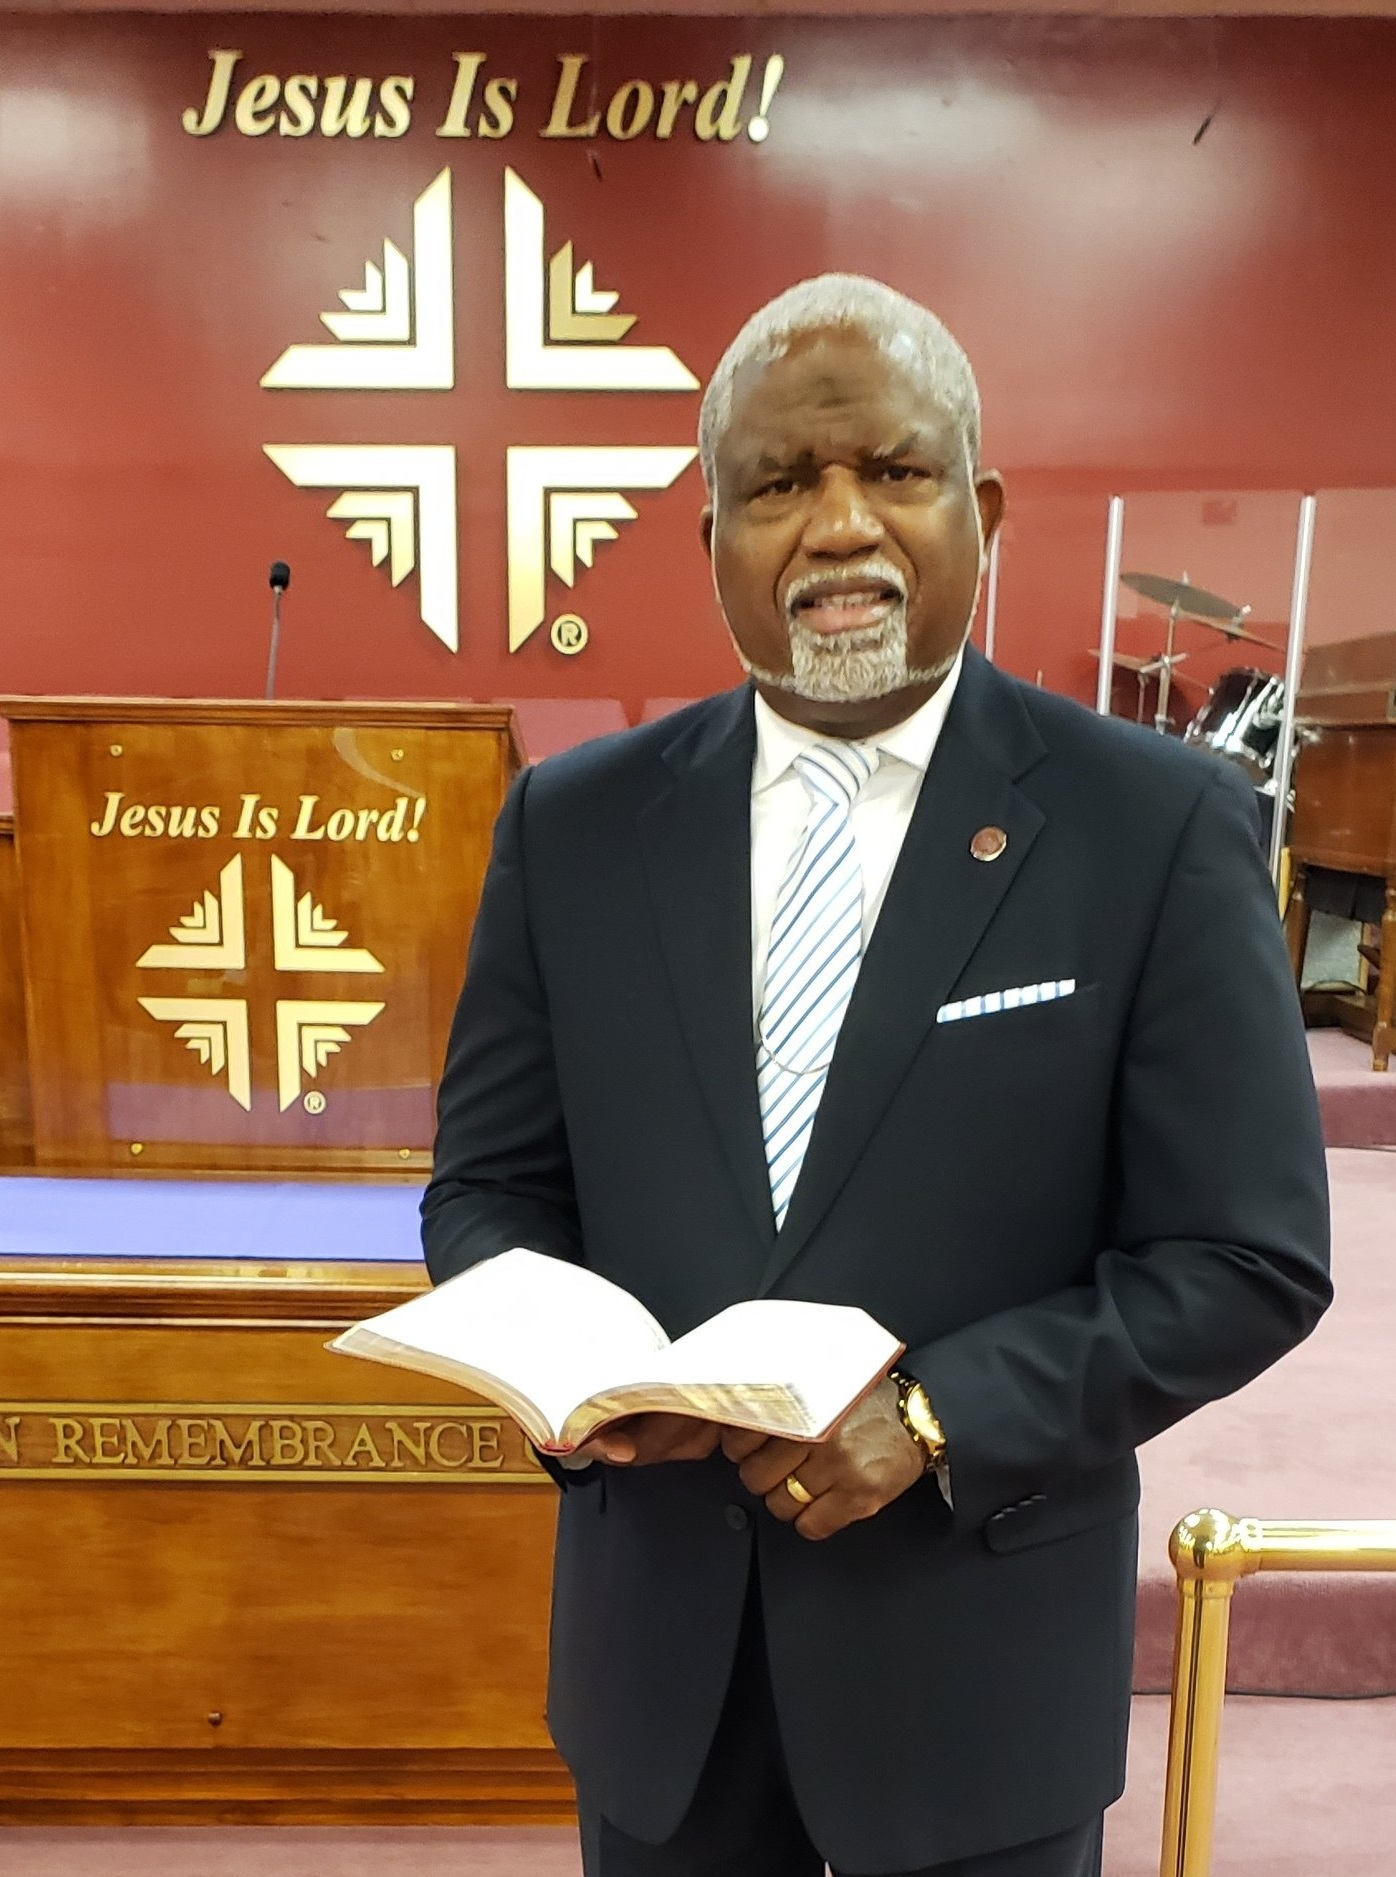 Pastor%2BOwes%2B02.jpg